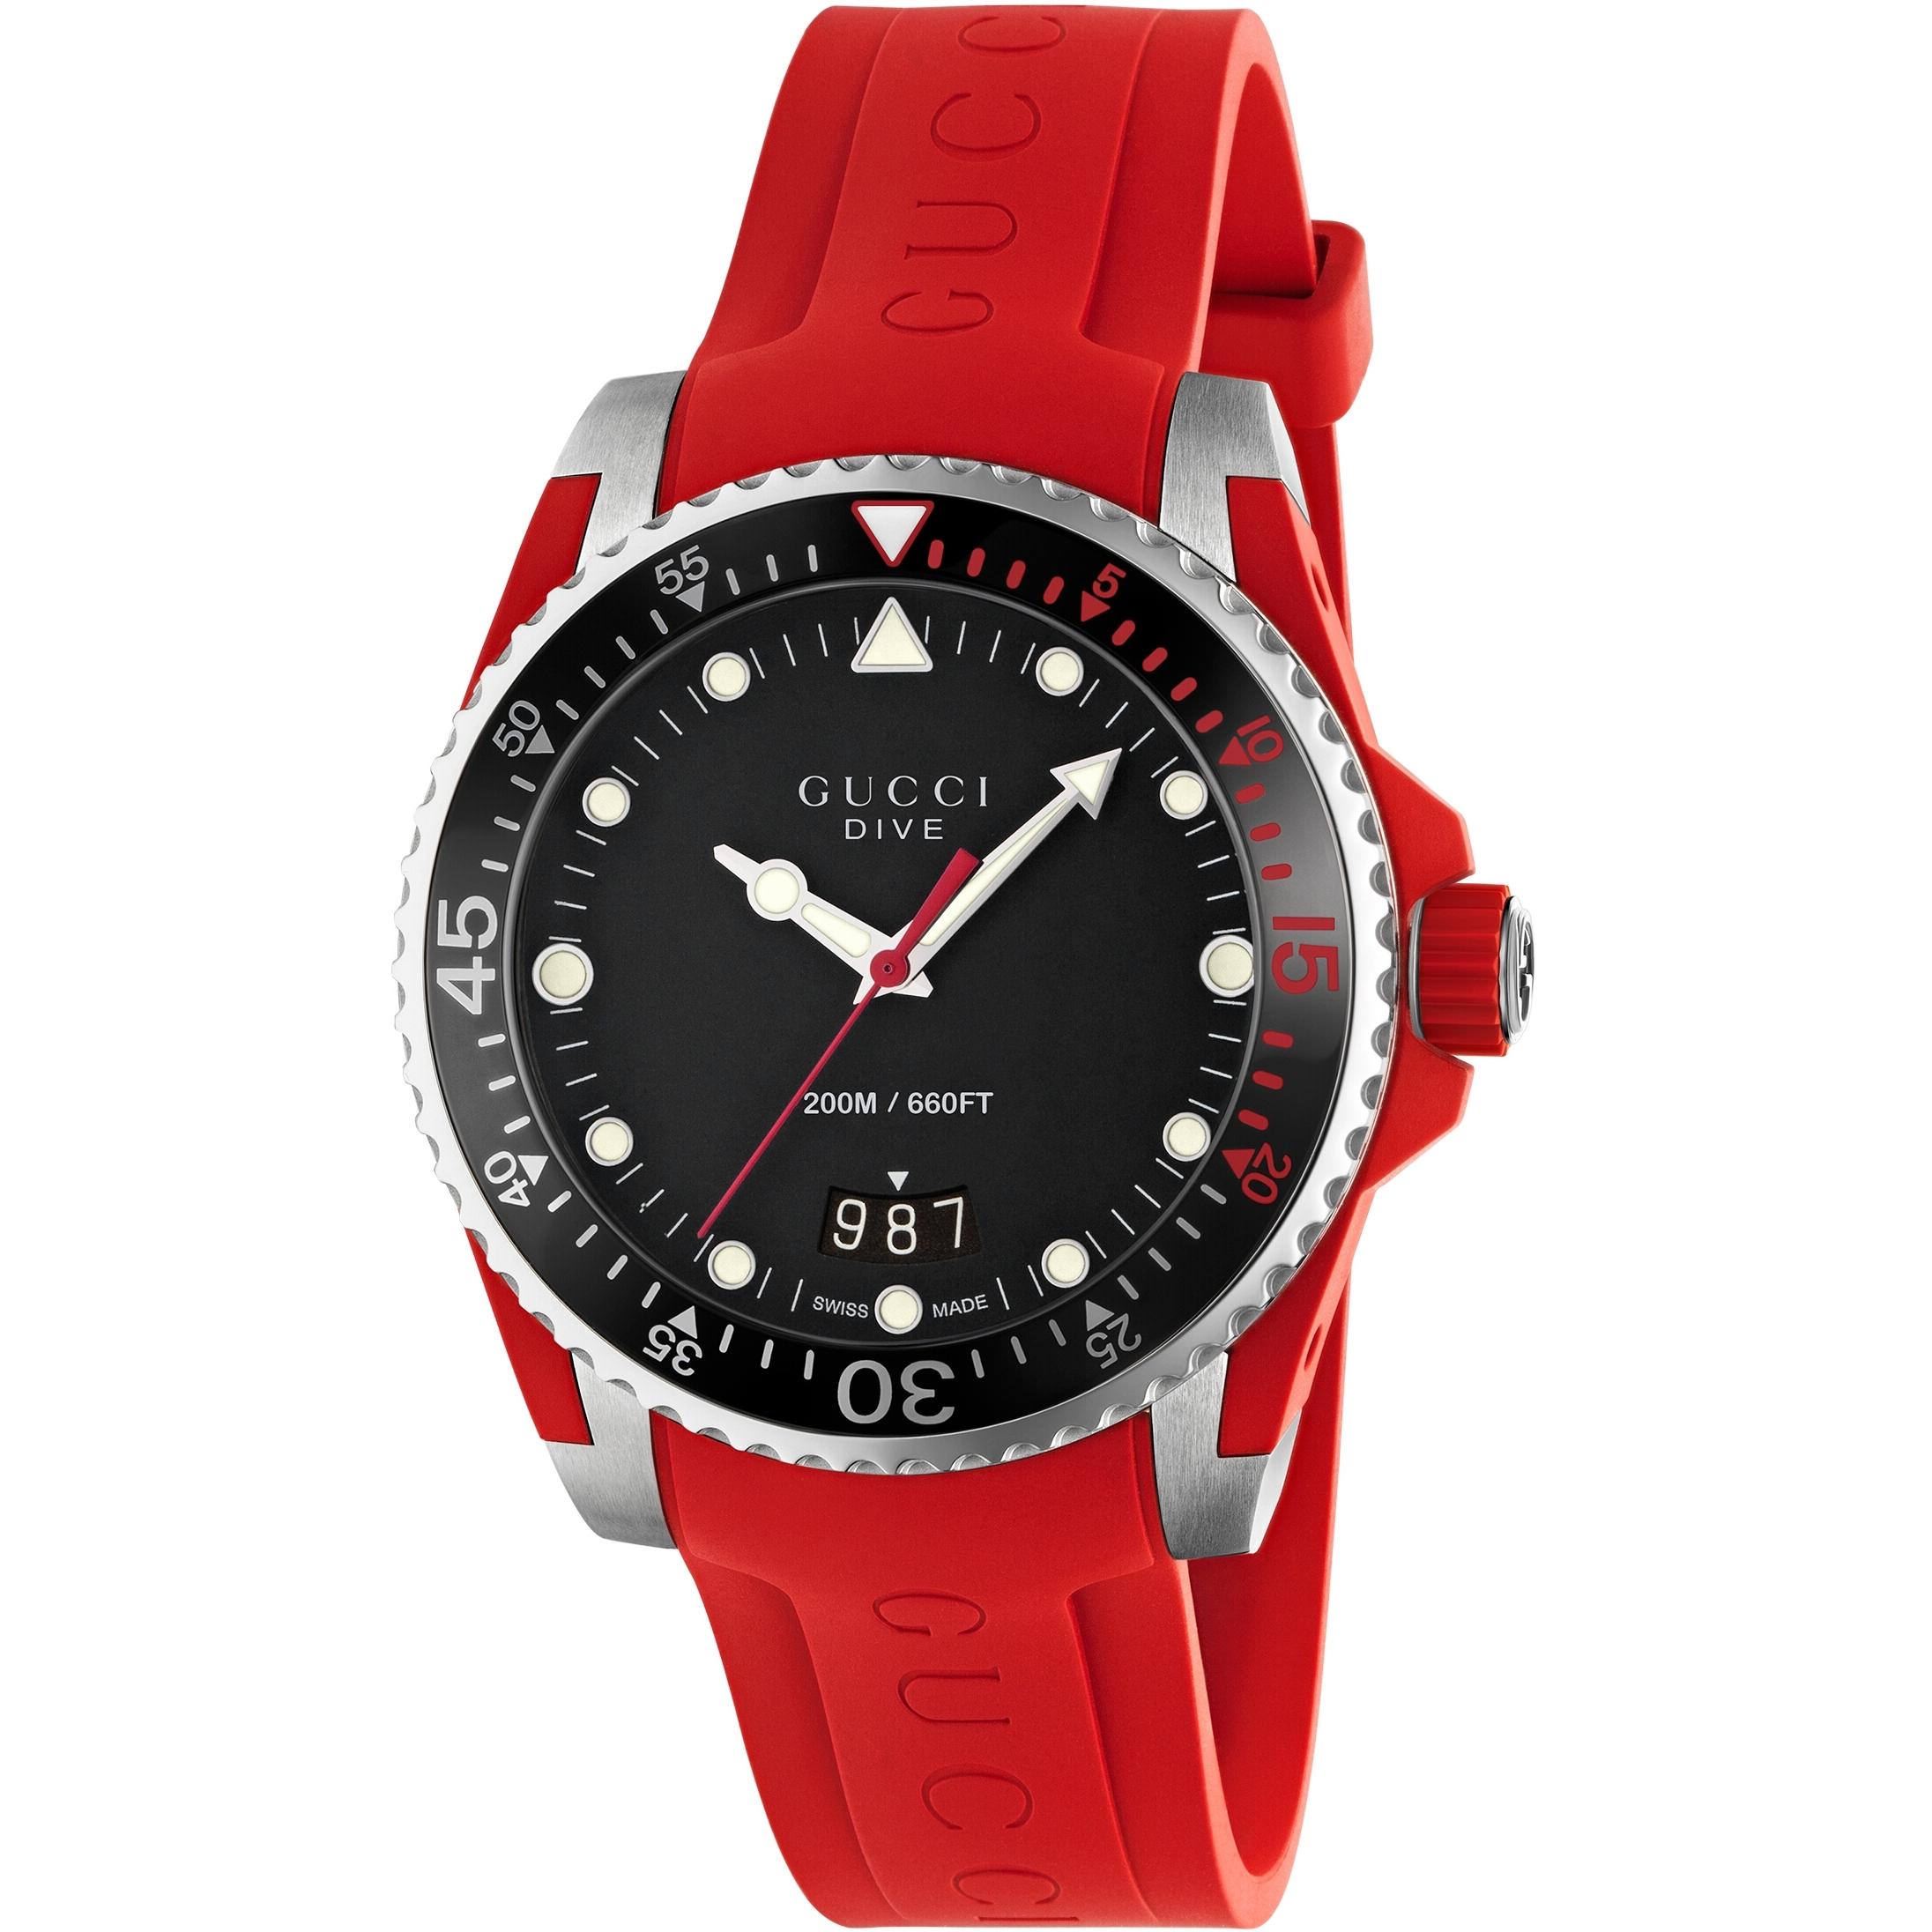 67f4fae8f35 Unisex Gucci Dive Watch (YA136309)